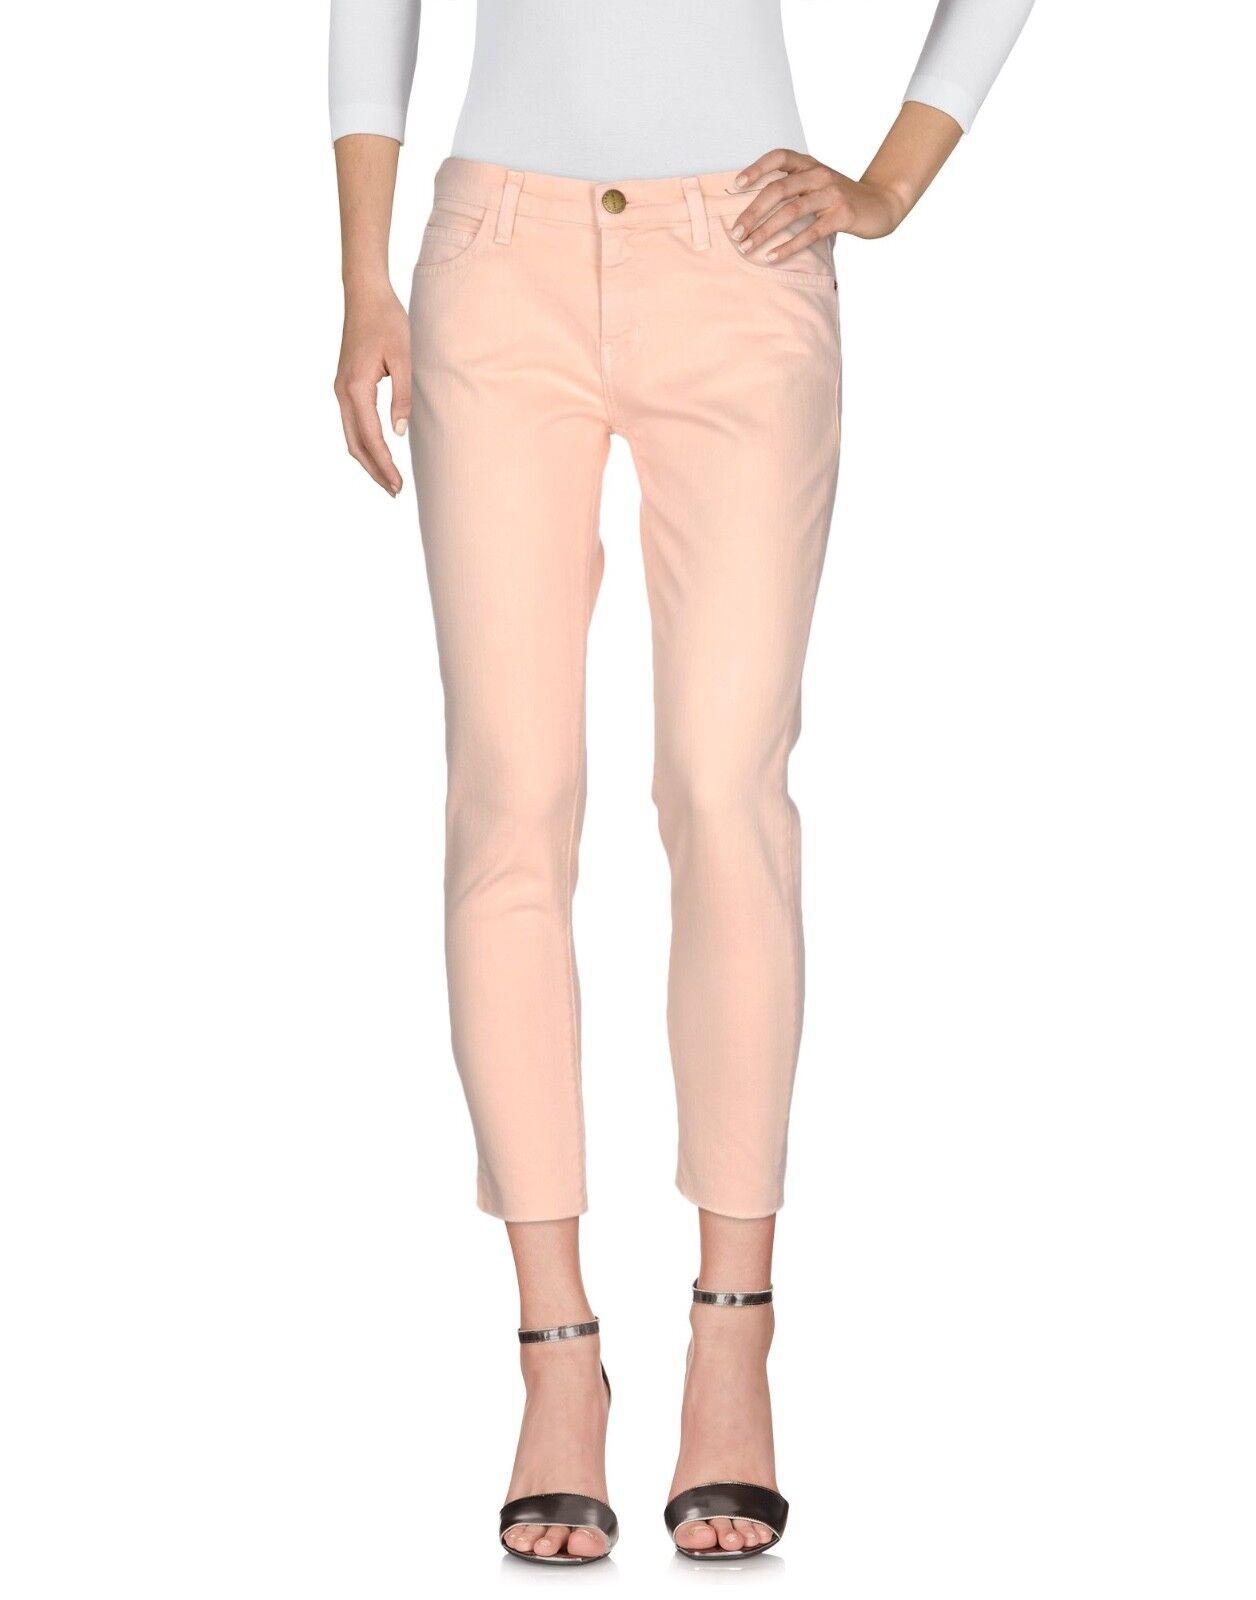 CURRENT ELLIOTT Jeans Apricot 28 NWT